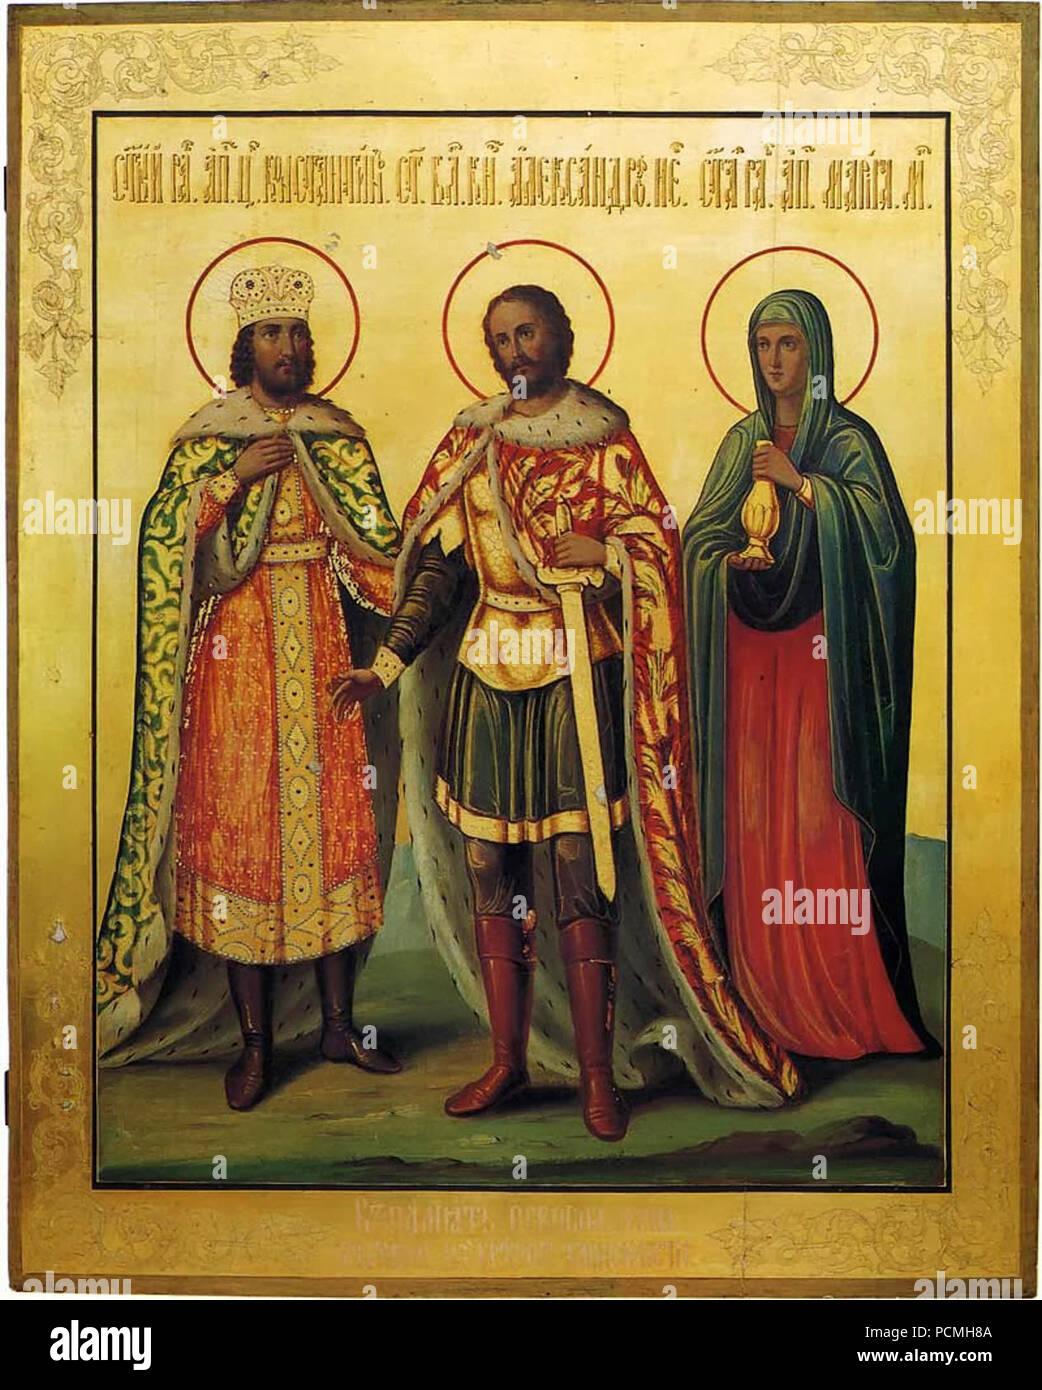 Alexandr Nevsky, Constantine the Great, Mary Magdelene (N.Tagil). - Stock Image